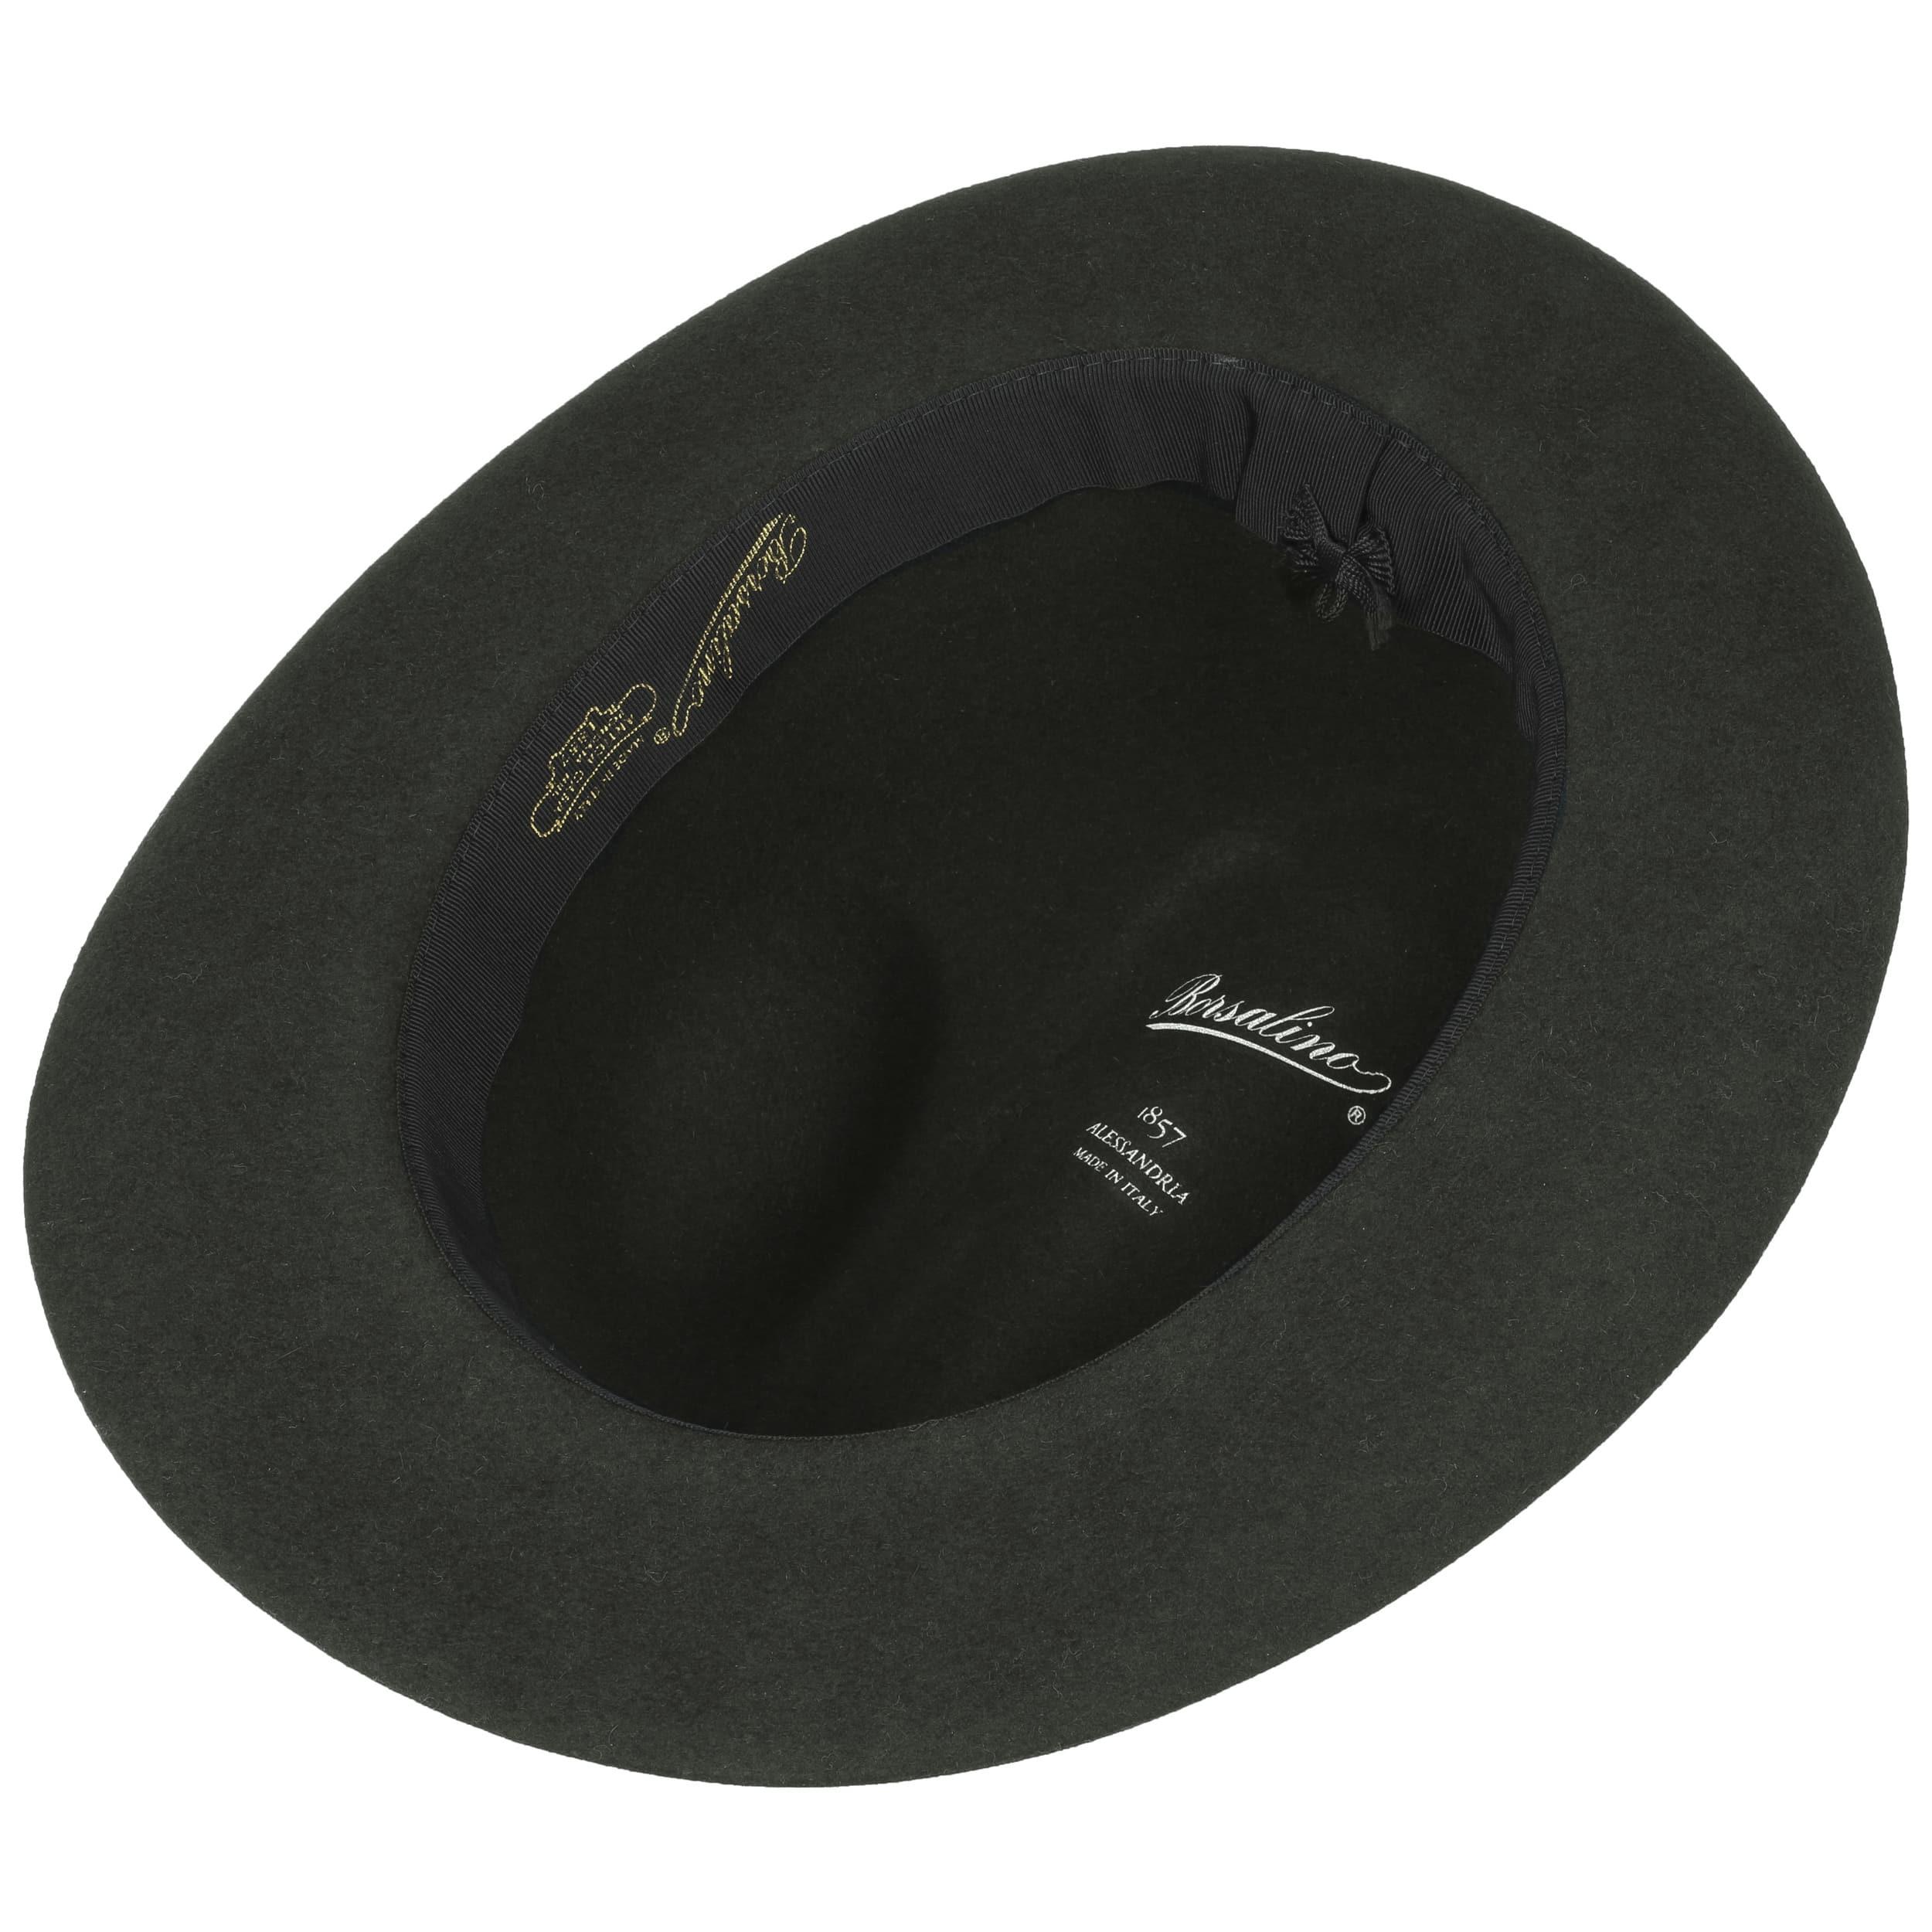 4a03154ec6376c ... Marengo Fur Felt Fedora Hat by Borsalino - anthracite 2 ...